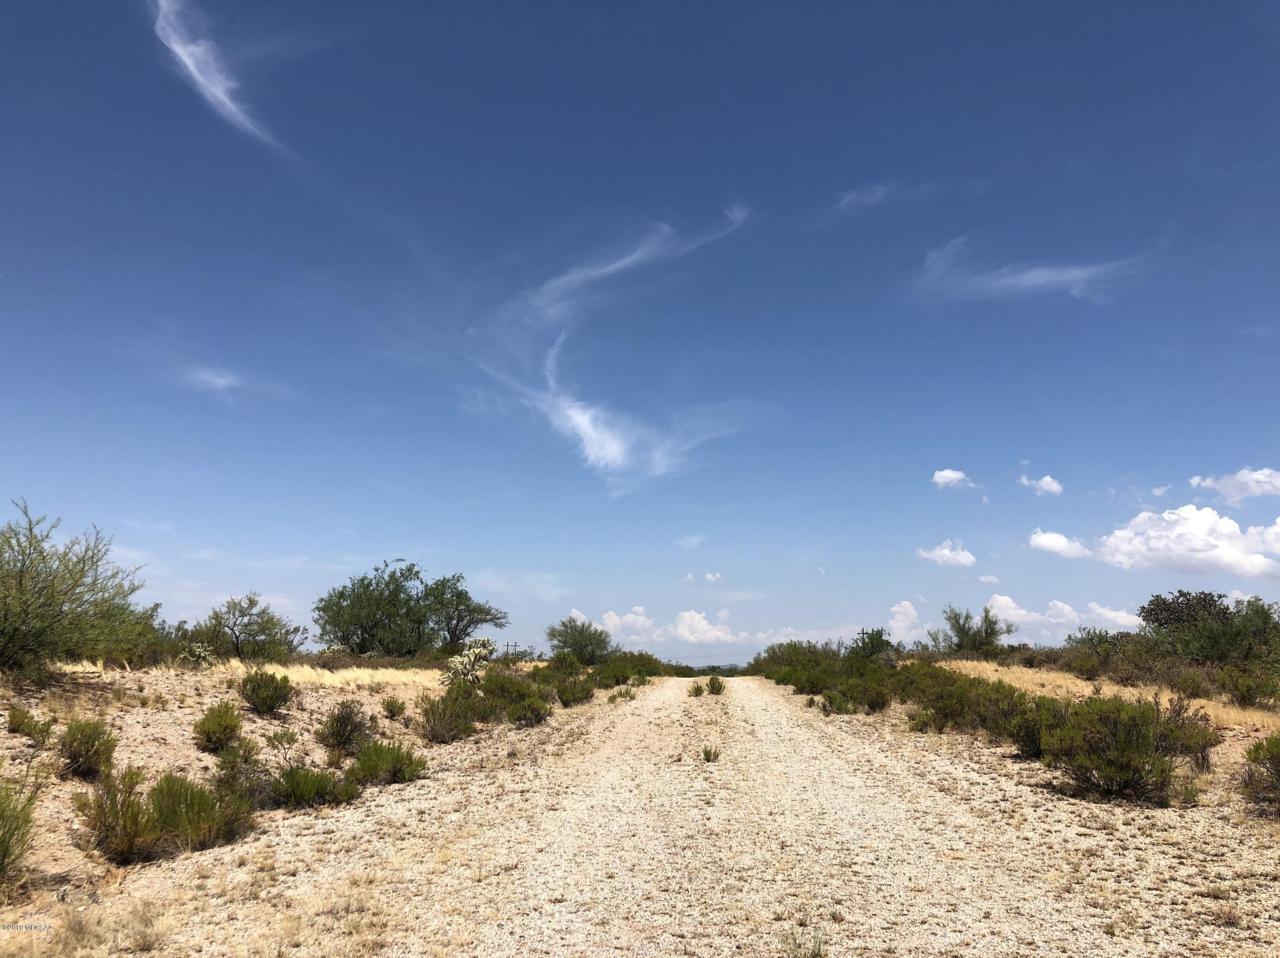 000 Chuckwagon Ranch Lot E,F,G,H,J Road - Photo 1